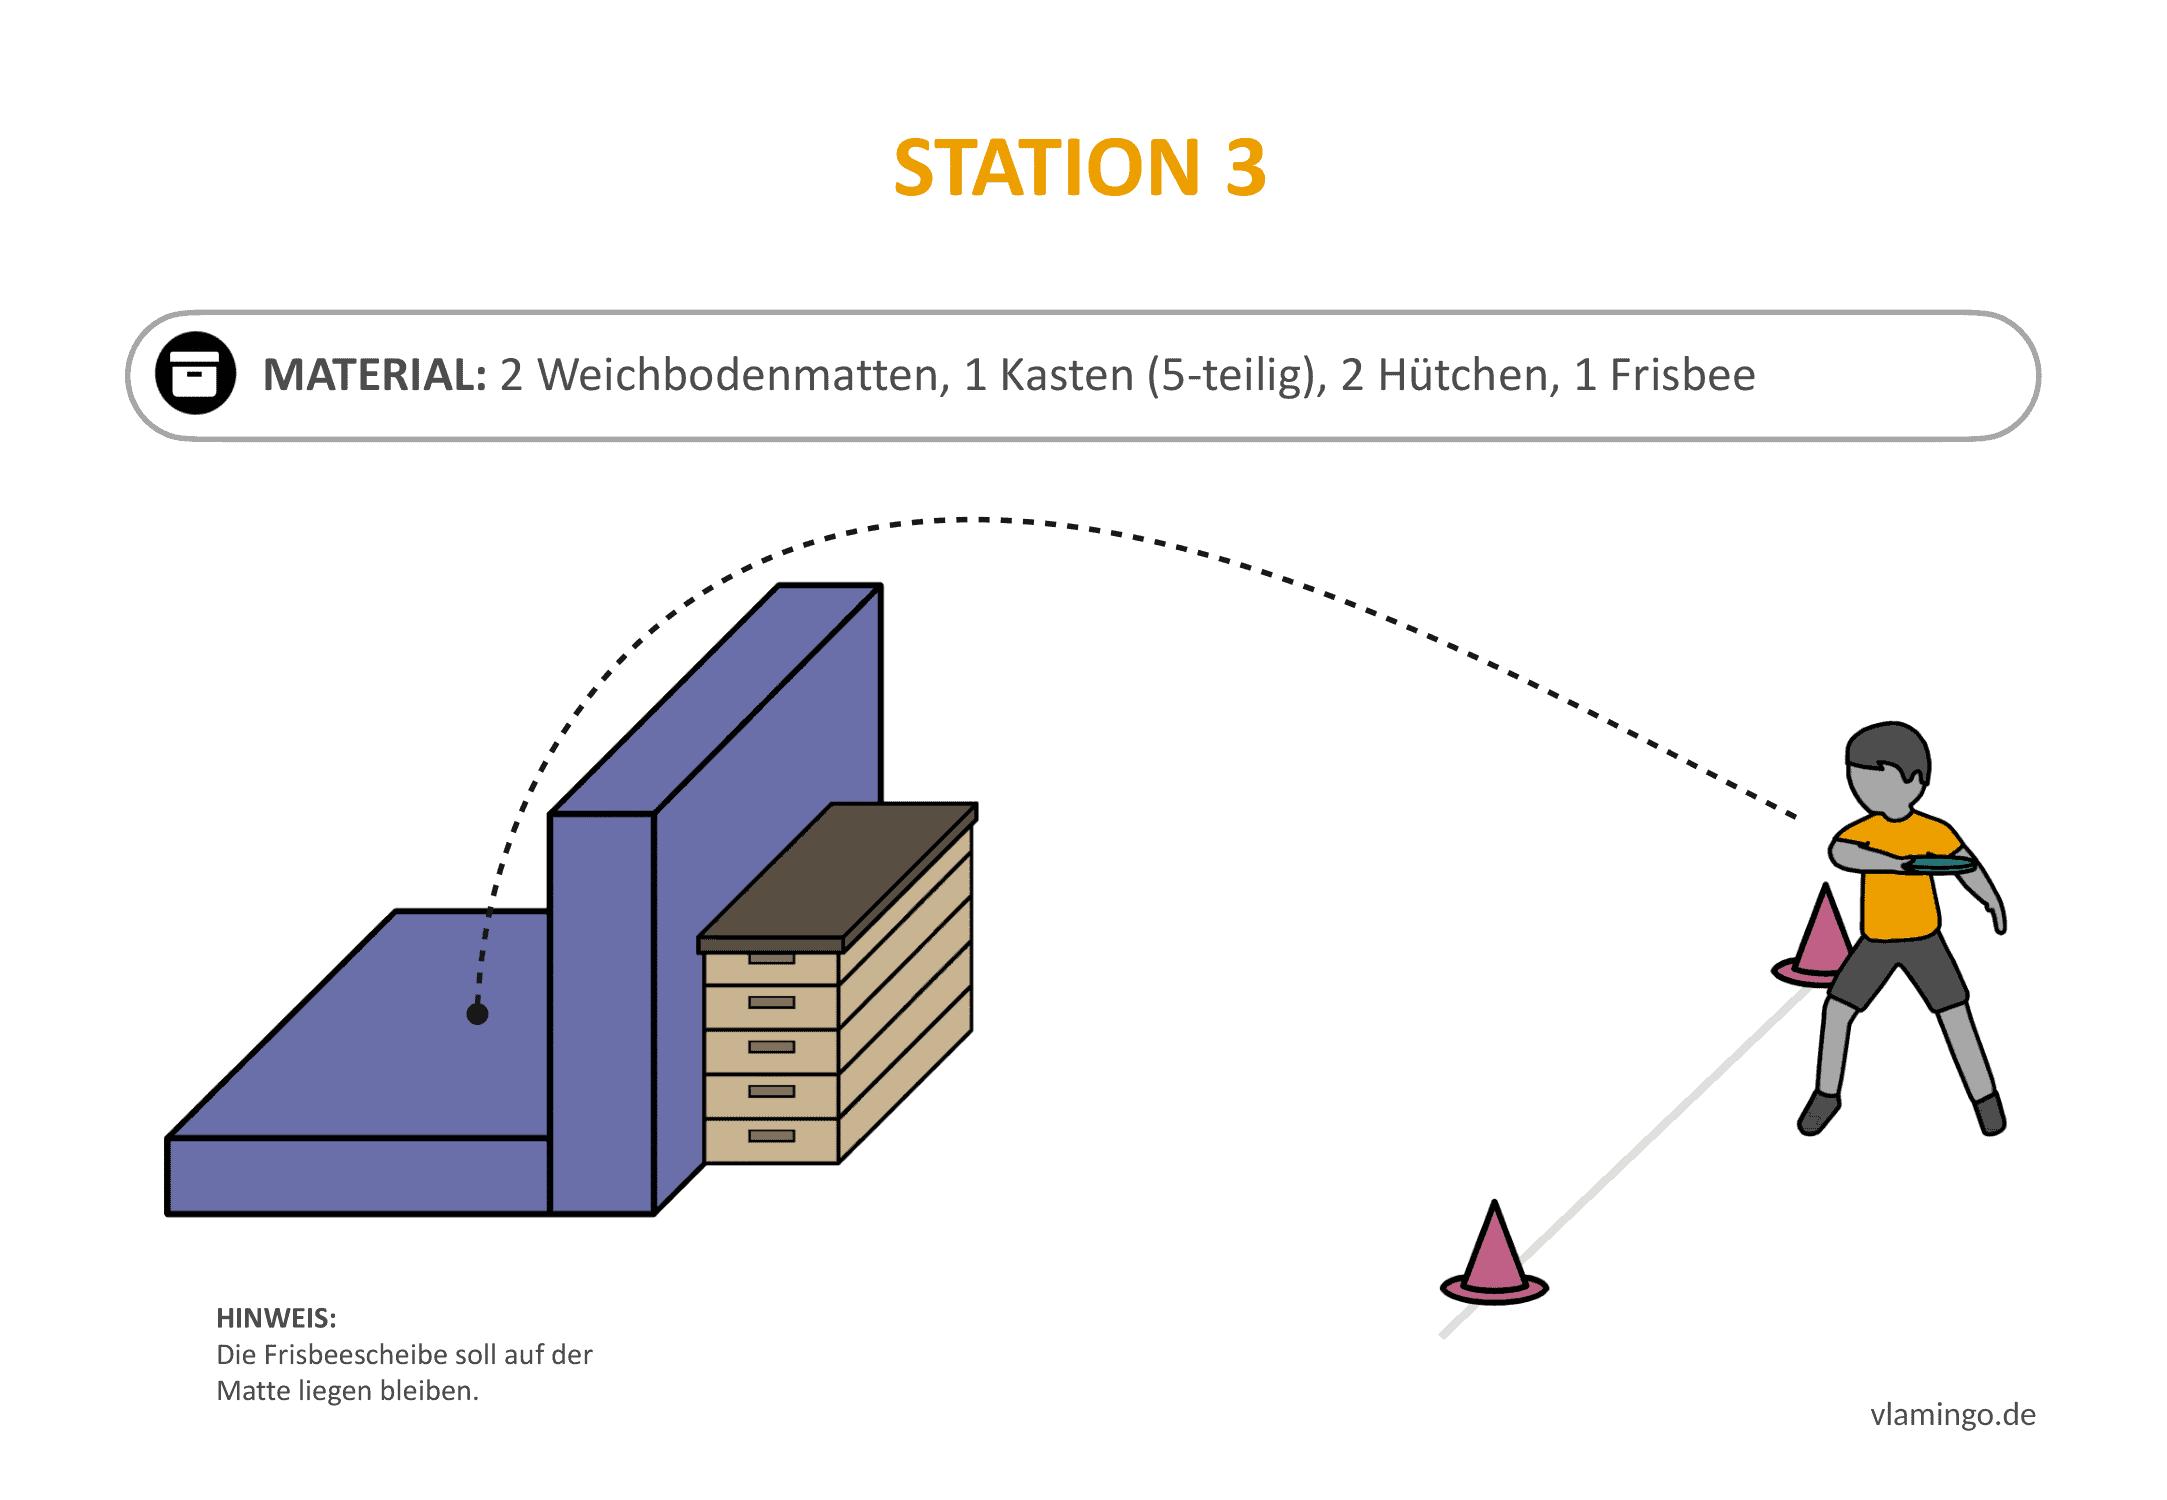 Frisbeegolf (Disc-Golf) - Station 3